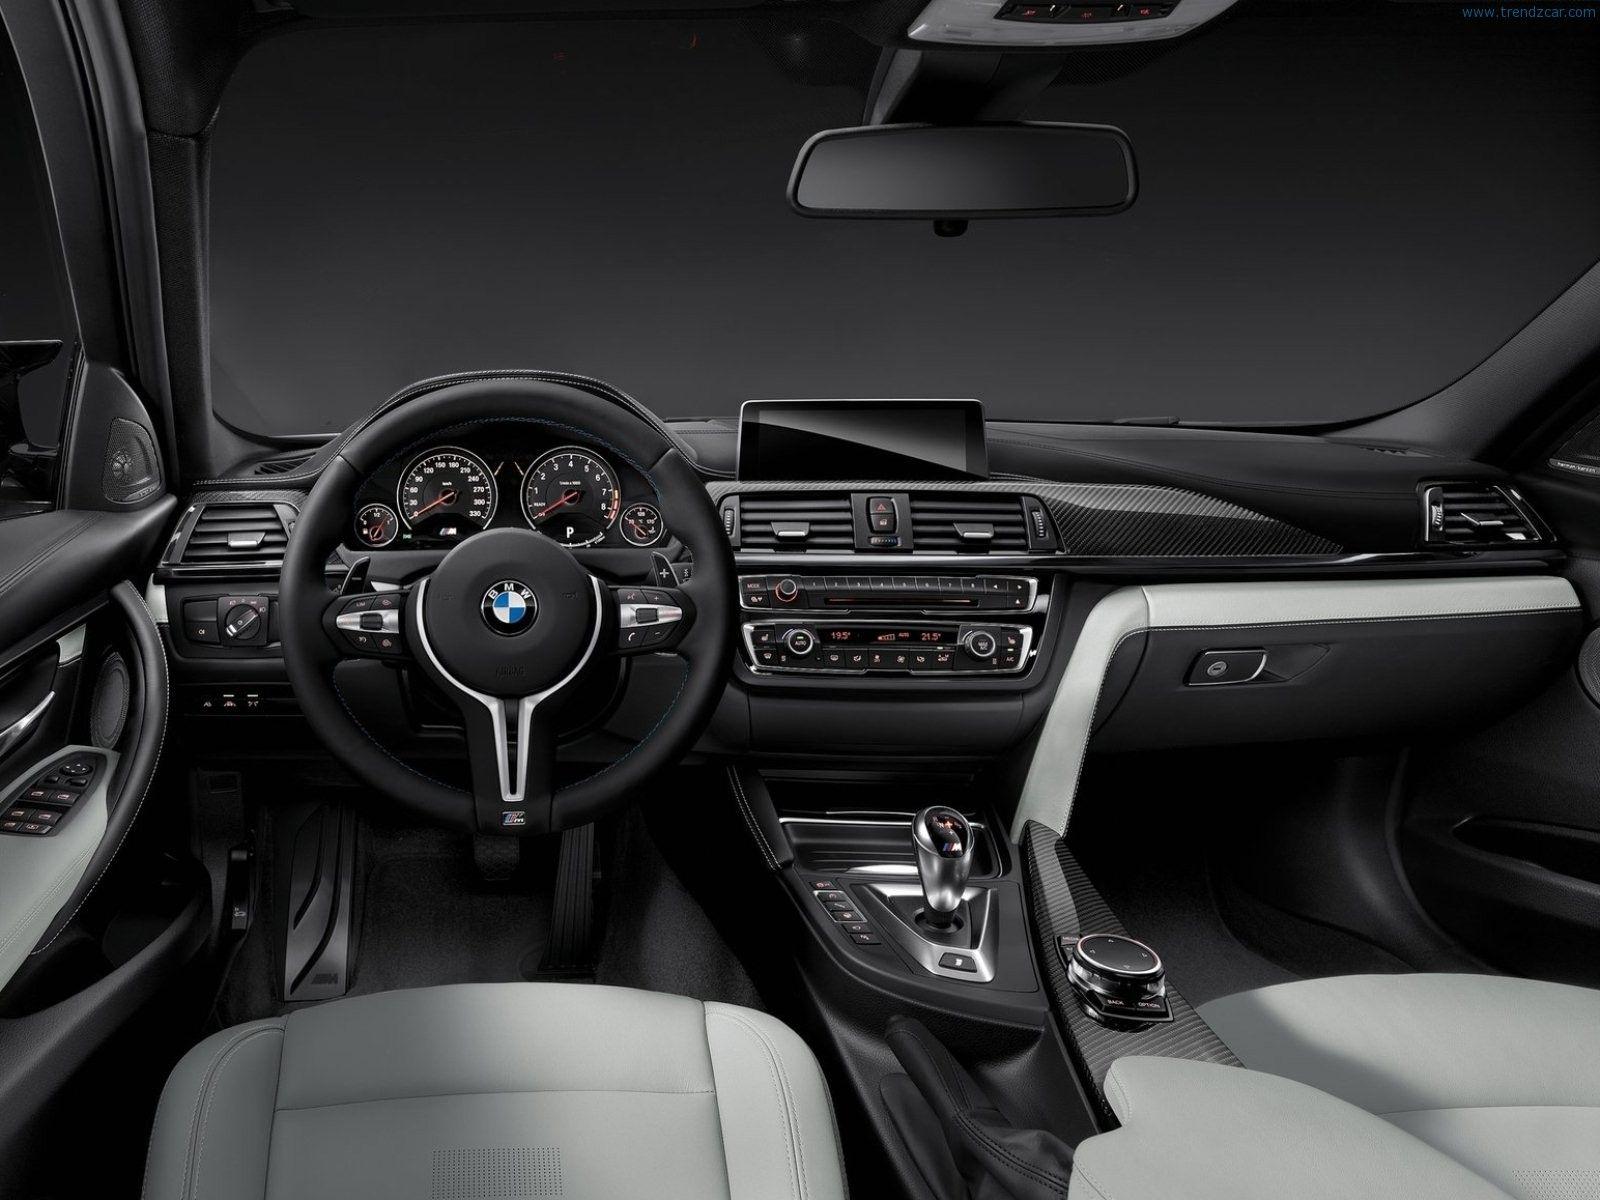 2015 Bmw M3 Sedan Interior Http Carwallpaper Org 2015 Bmw M3